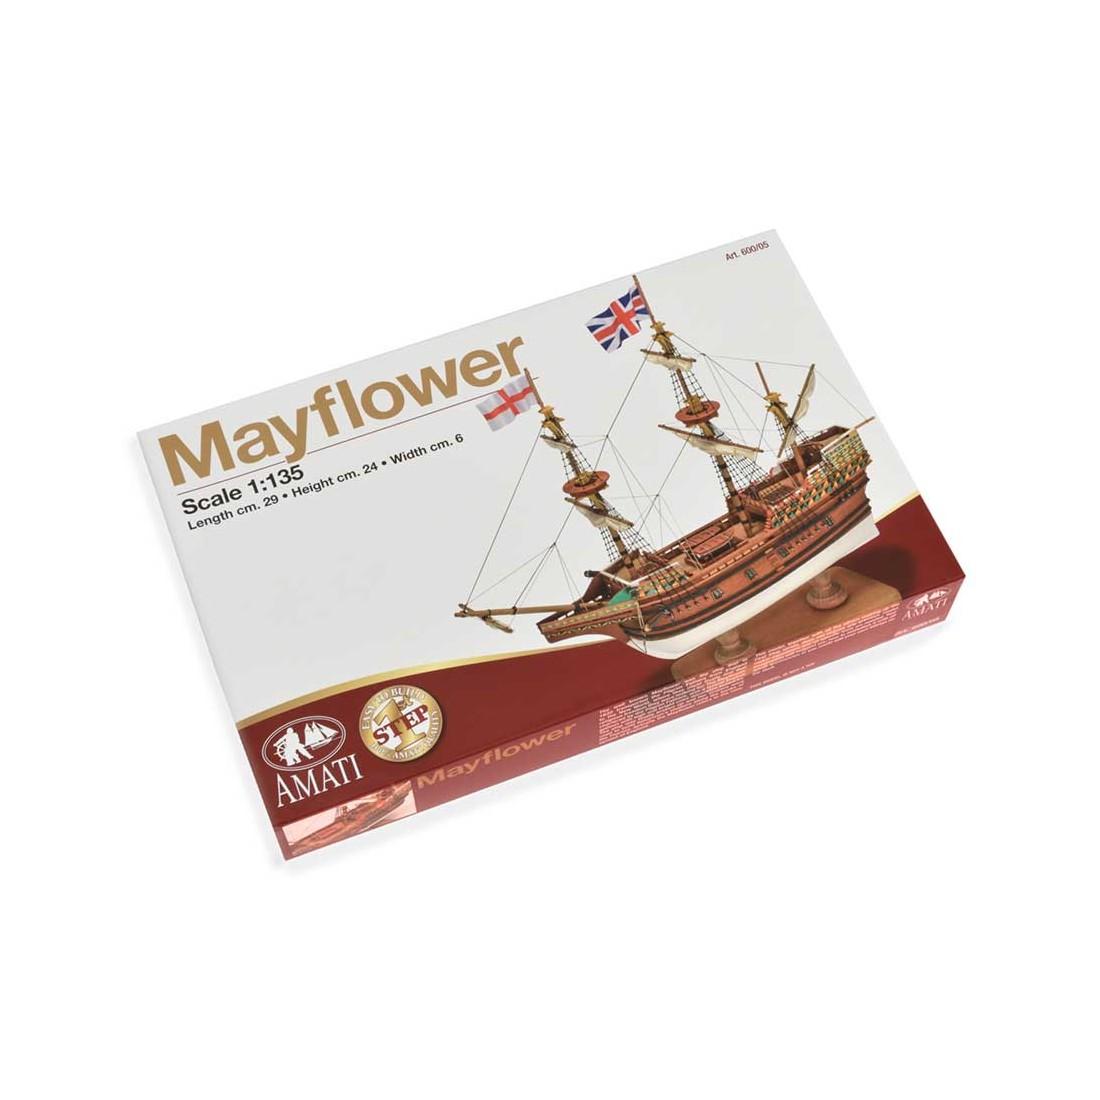 Mayflower - First Step